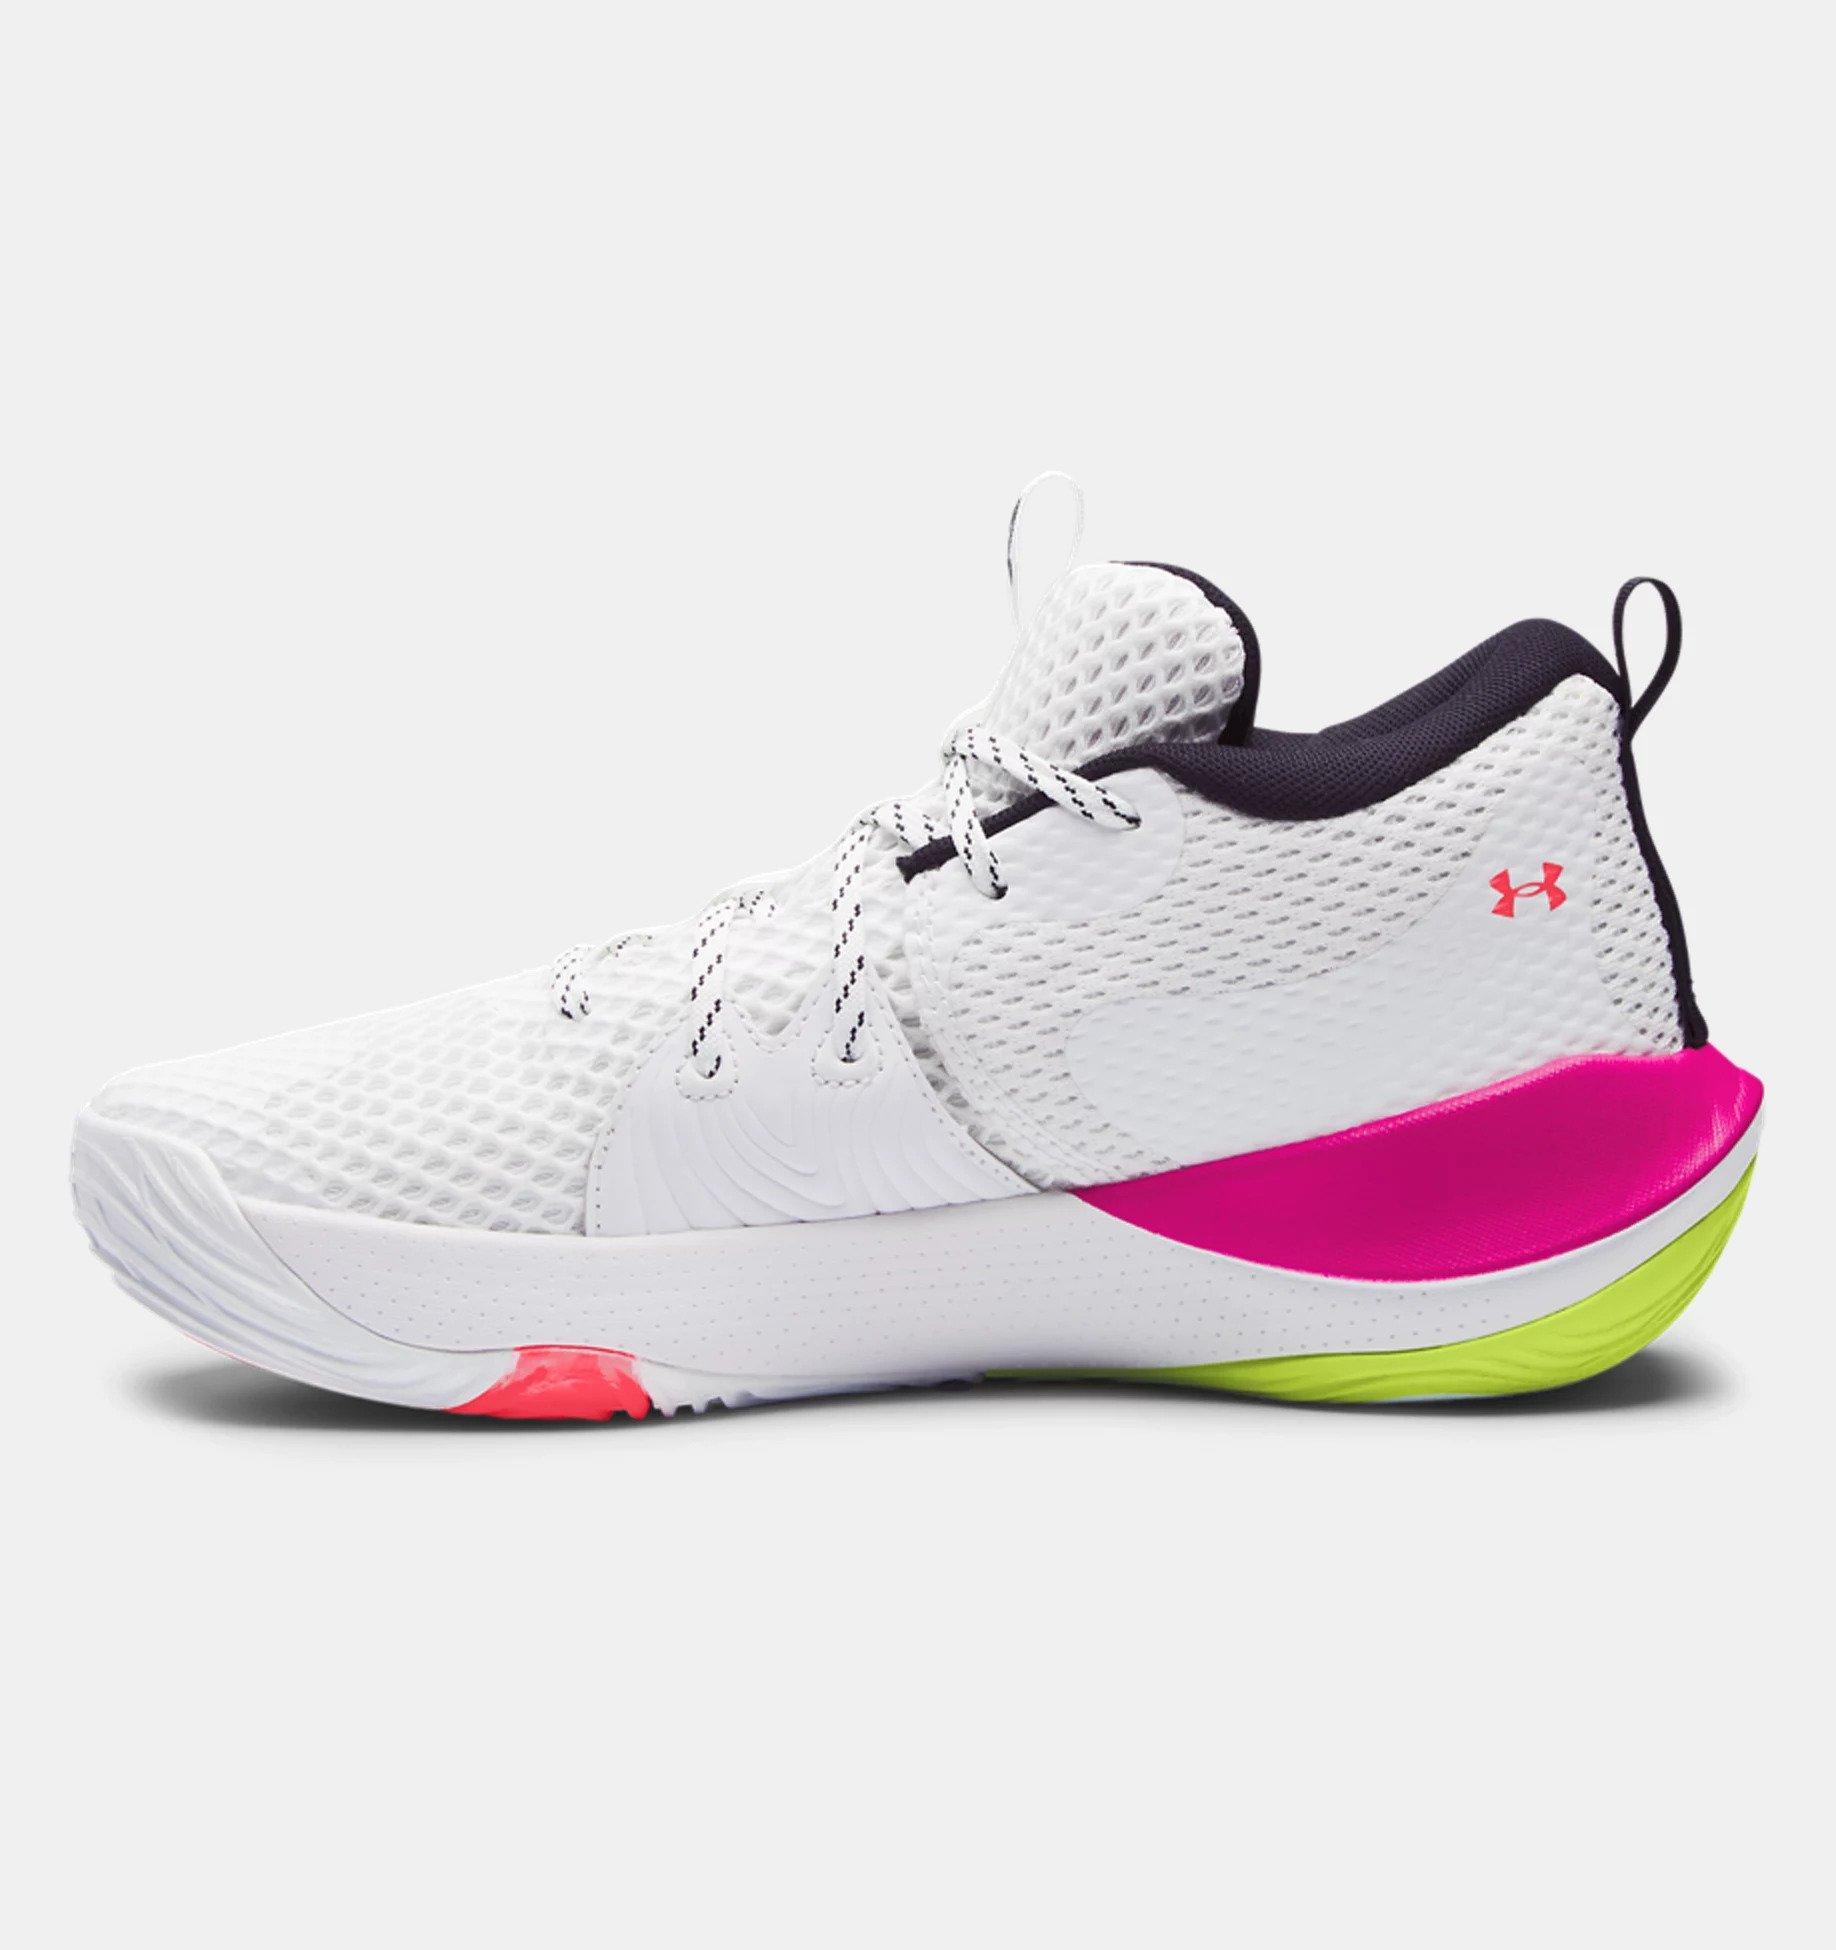 Best Women Basketball Shoes: Embiid One